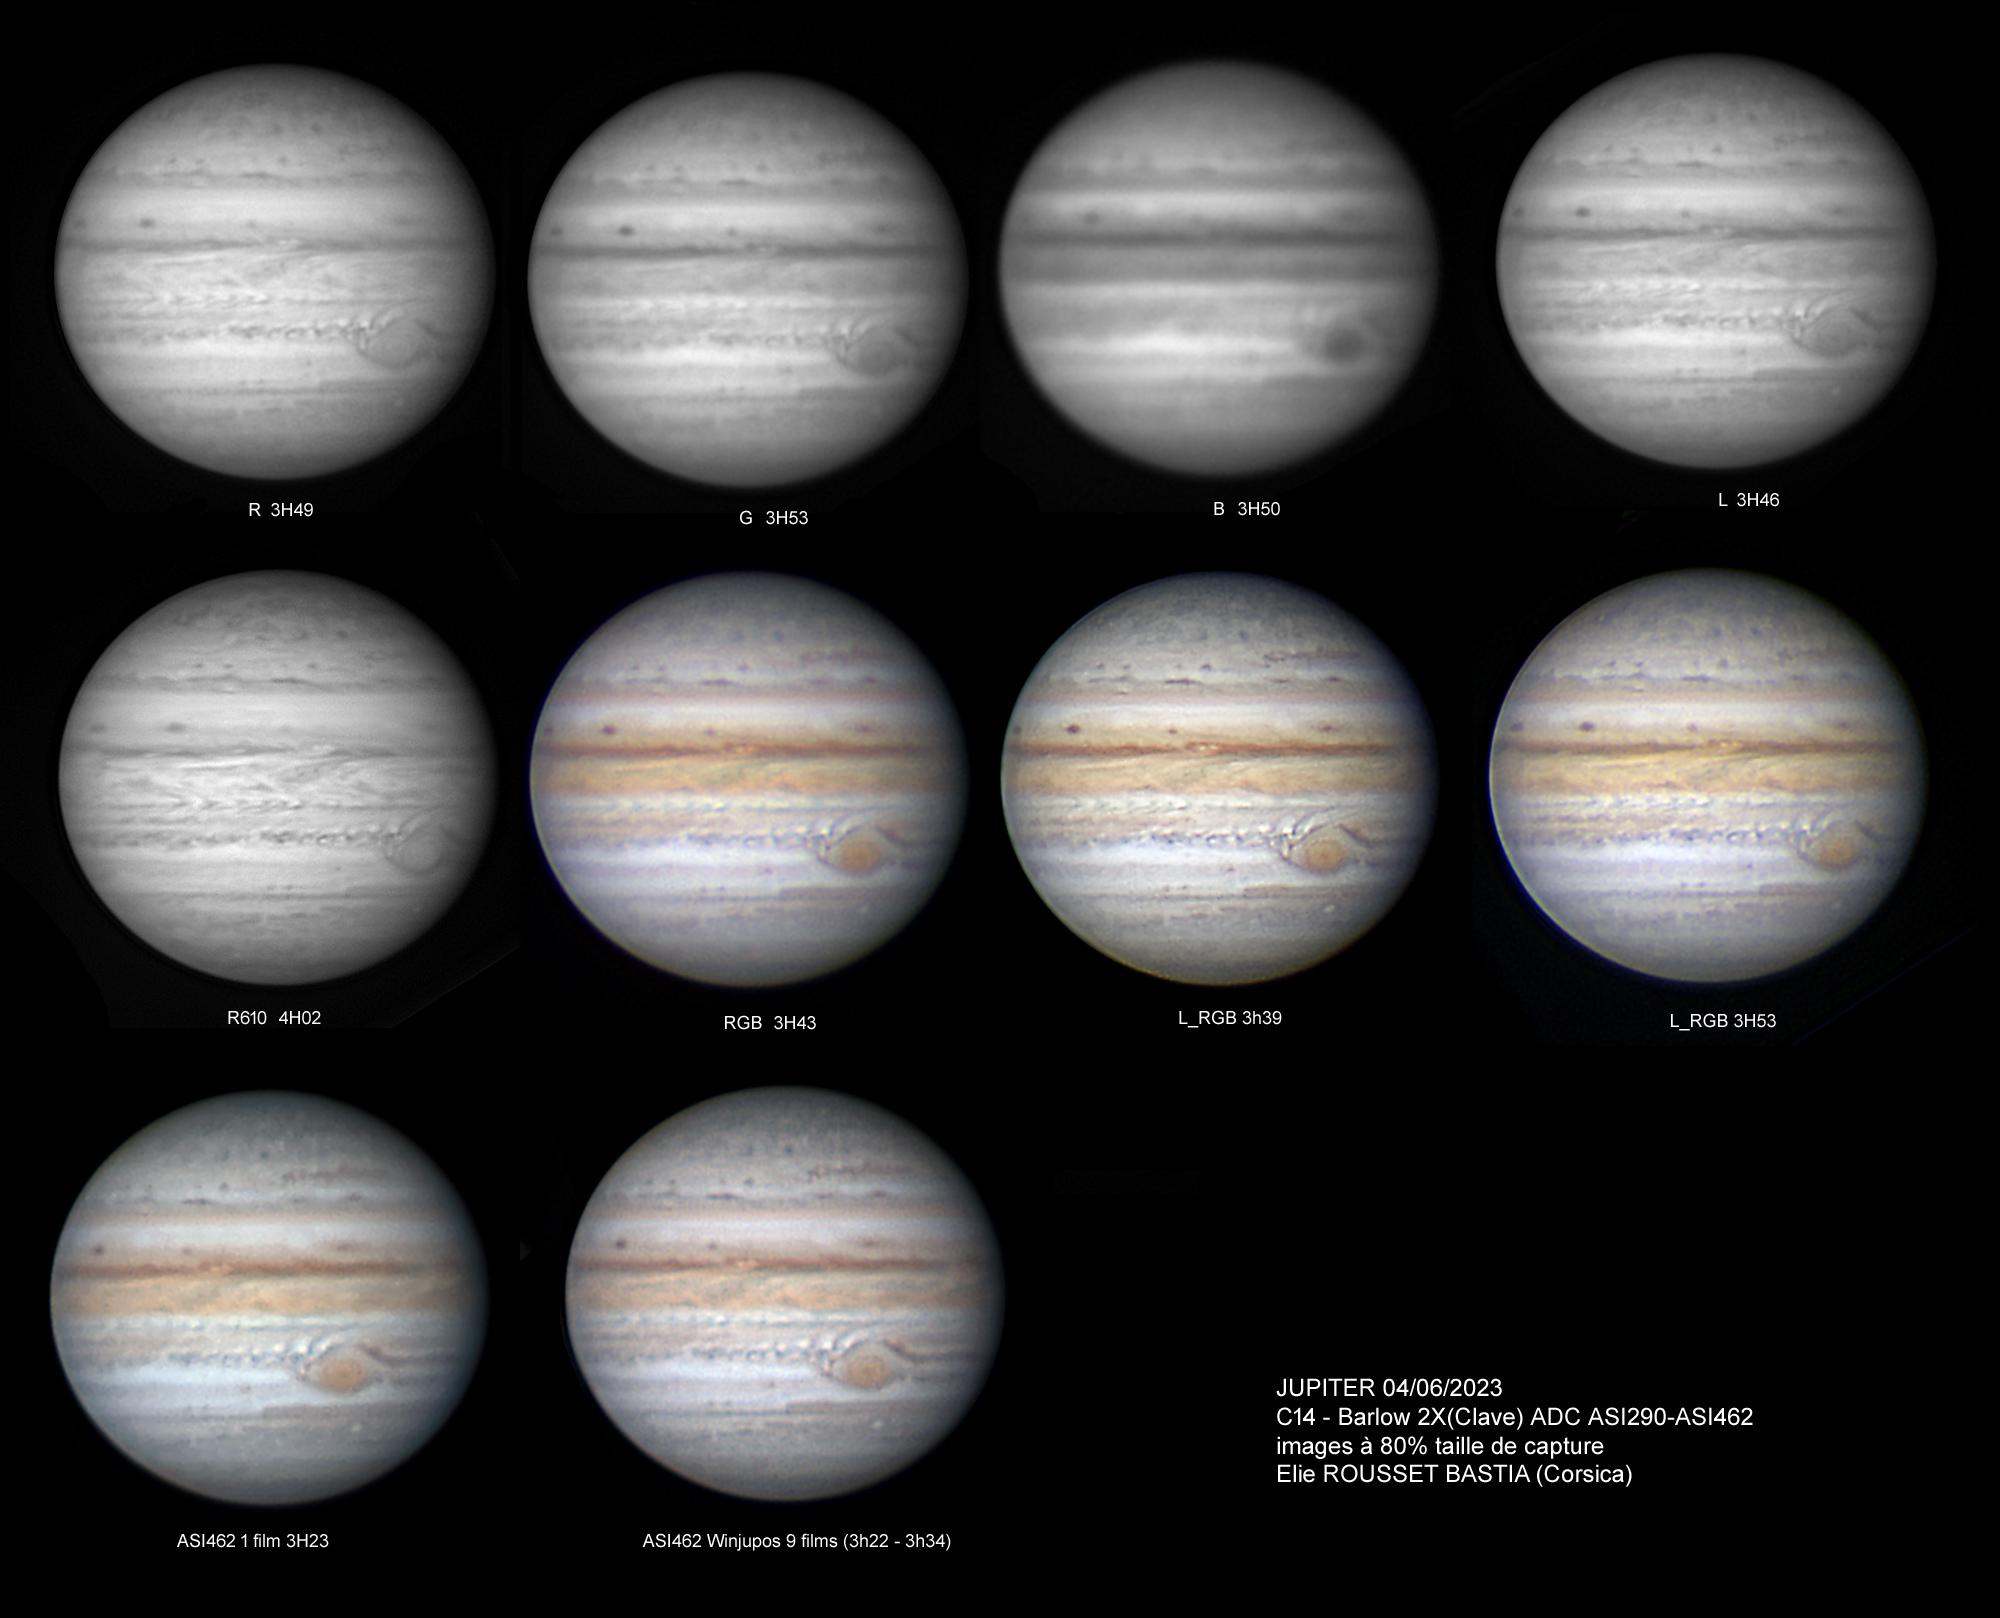 large.JUP-04-06-2021-PLANCHE1.jpg.105f4ed19203948828ee16de1bb46f6b.jpg